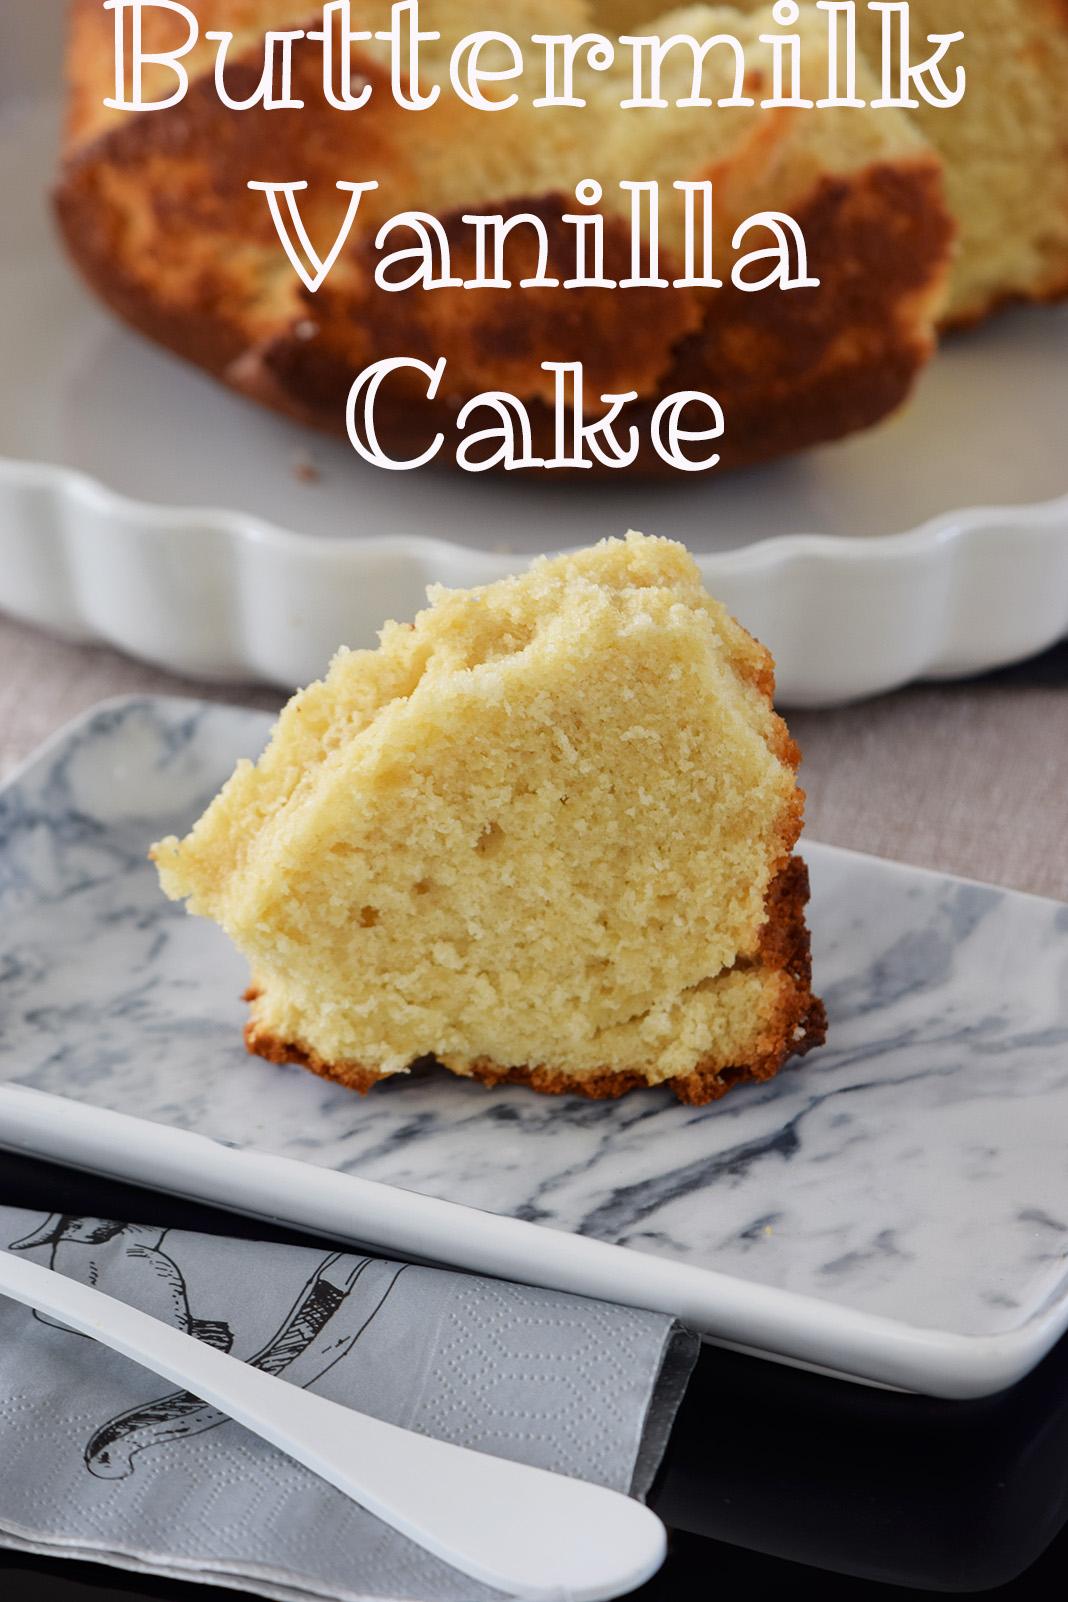 The fluffiest vanilla cake